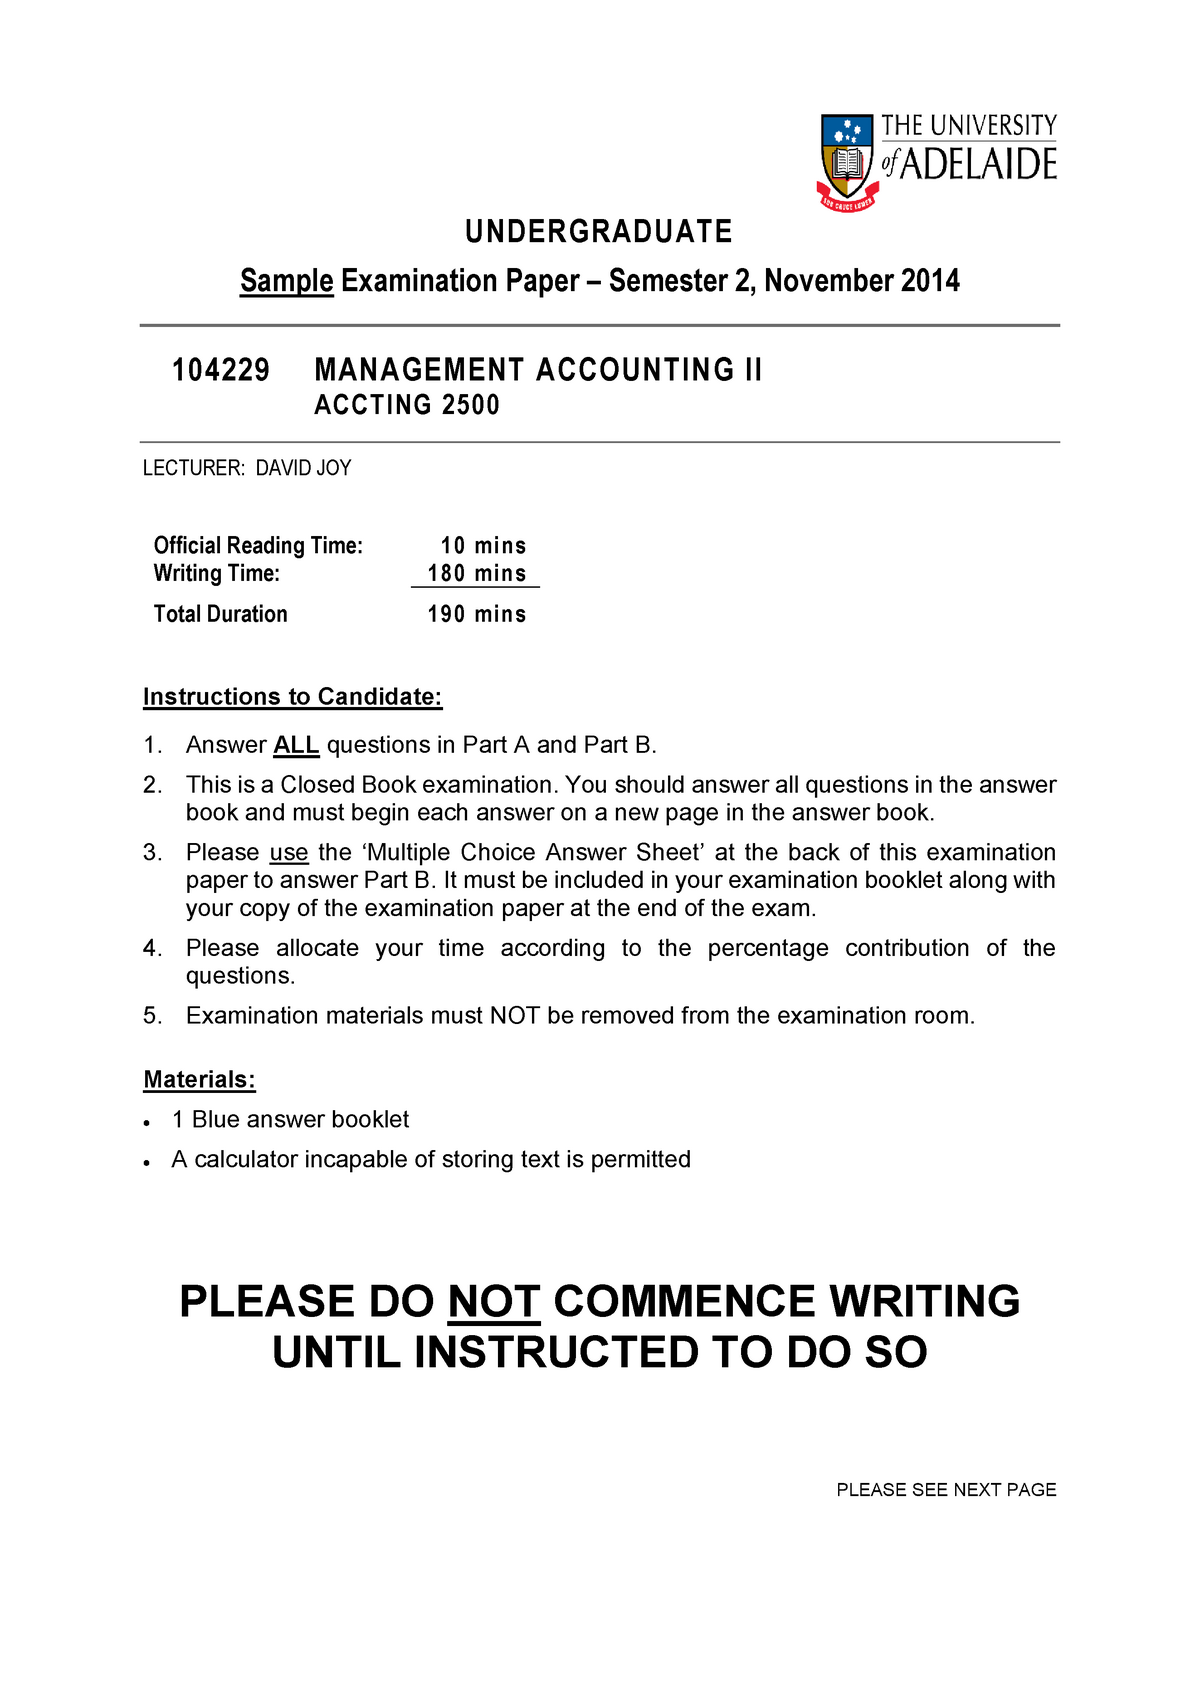 Management Accounting II - Sample Exam S2 2014 - Adelaide